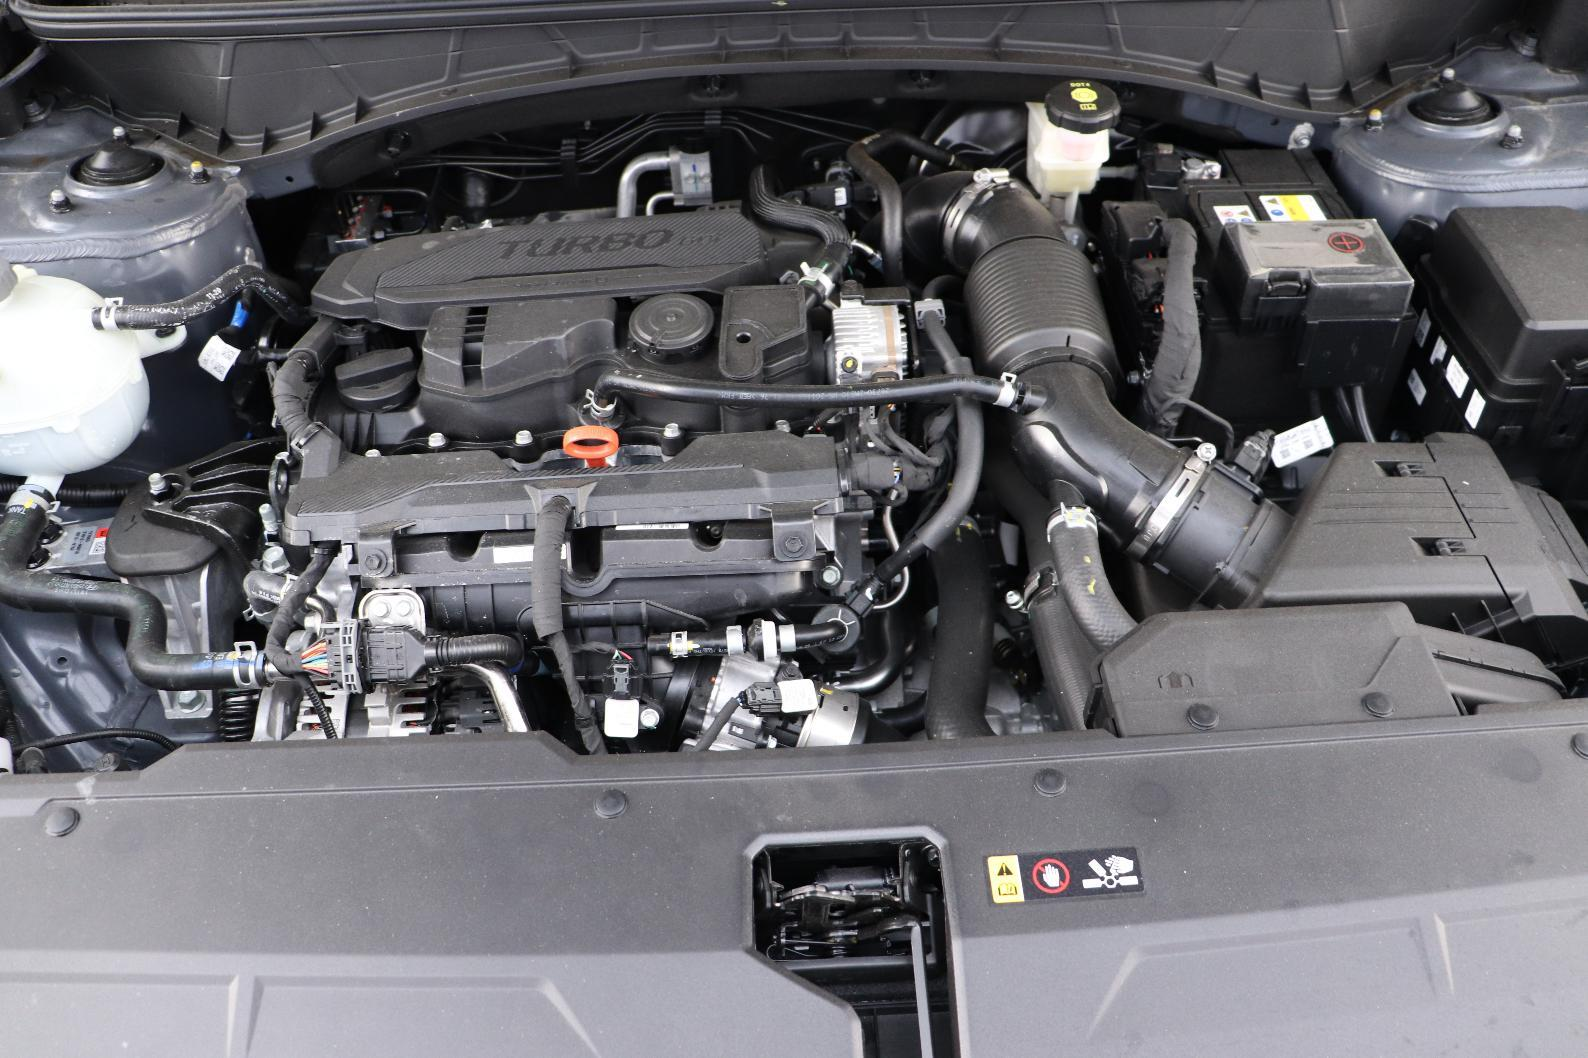 HYUNDAI TUCSON 1.6 T-GDI 150 Hybrid 48V iBVM Intuitive